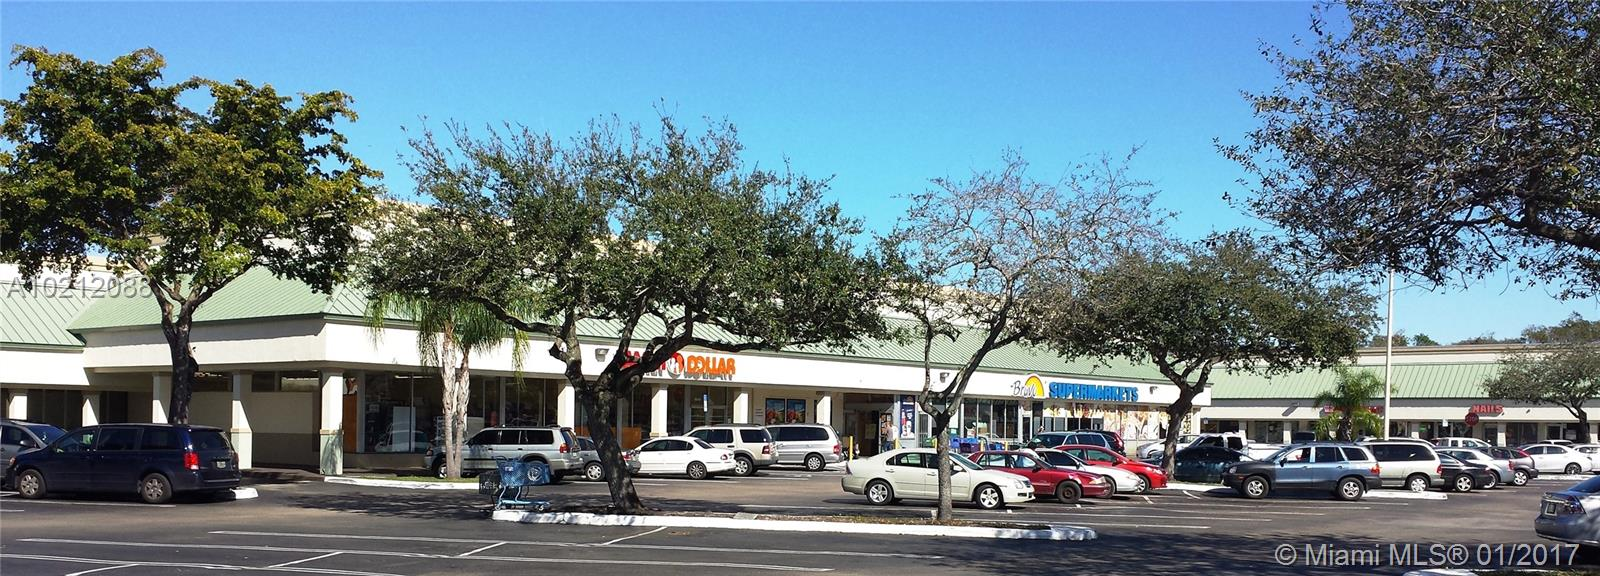 3017 Johnson St, Hollywood, FL 33021